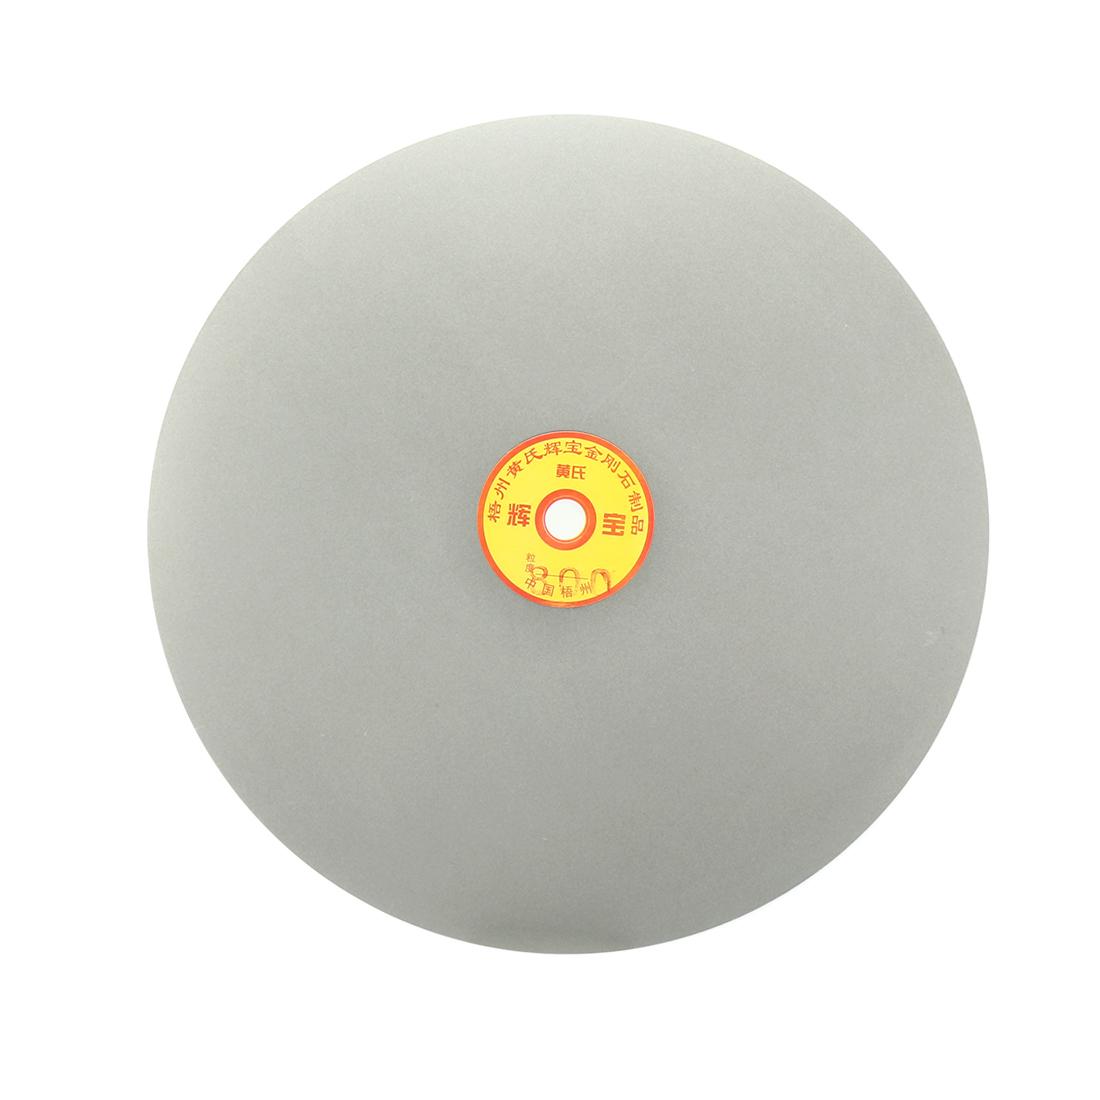 250mm 10-inch Grit 800 Diamond Coated Flat Lap Disk Wheel Grinding Sanding Disc